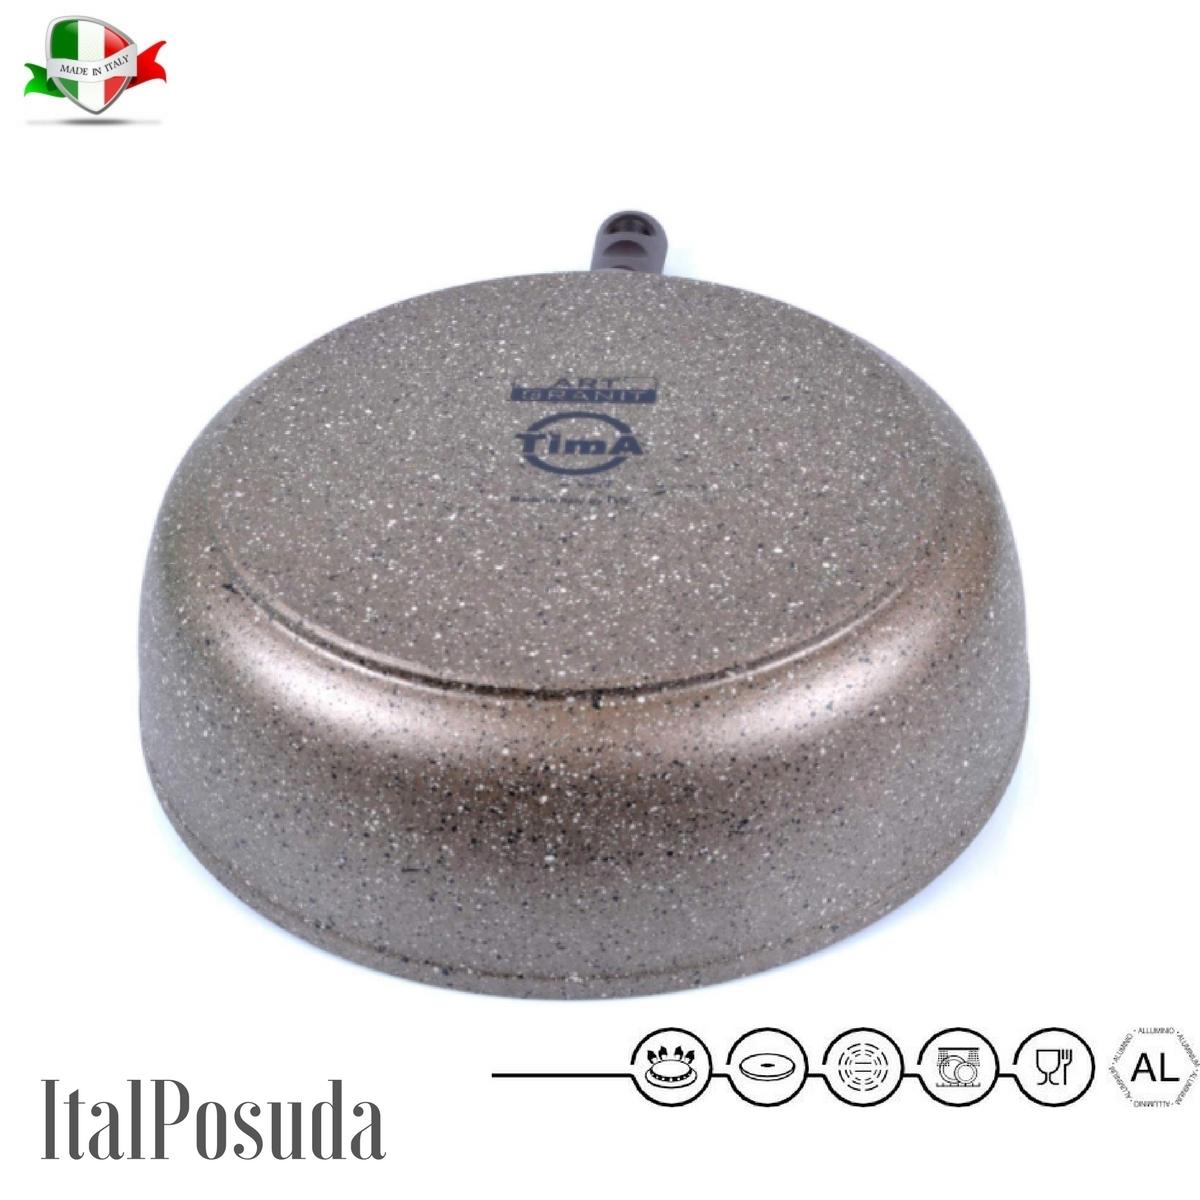 Сотейник со съёмной ручкой TIMA Art Granit, 24 см www.Ital-Posuda.ru